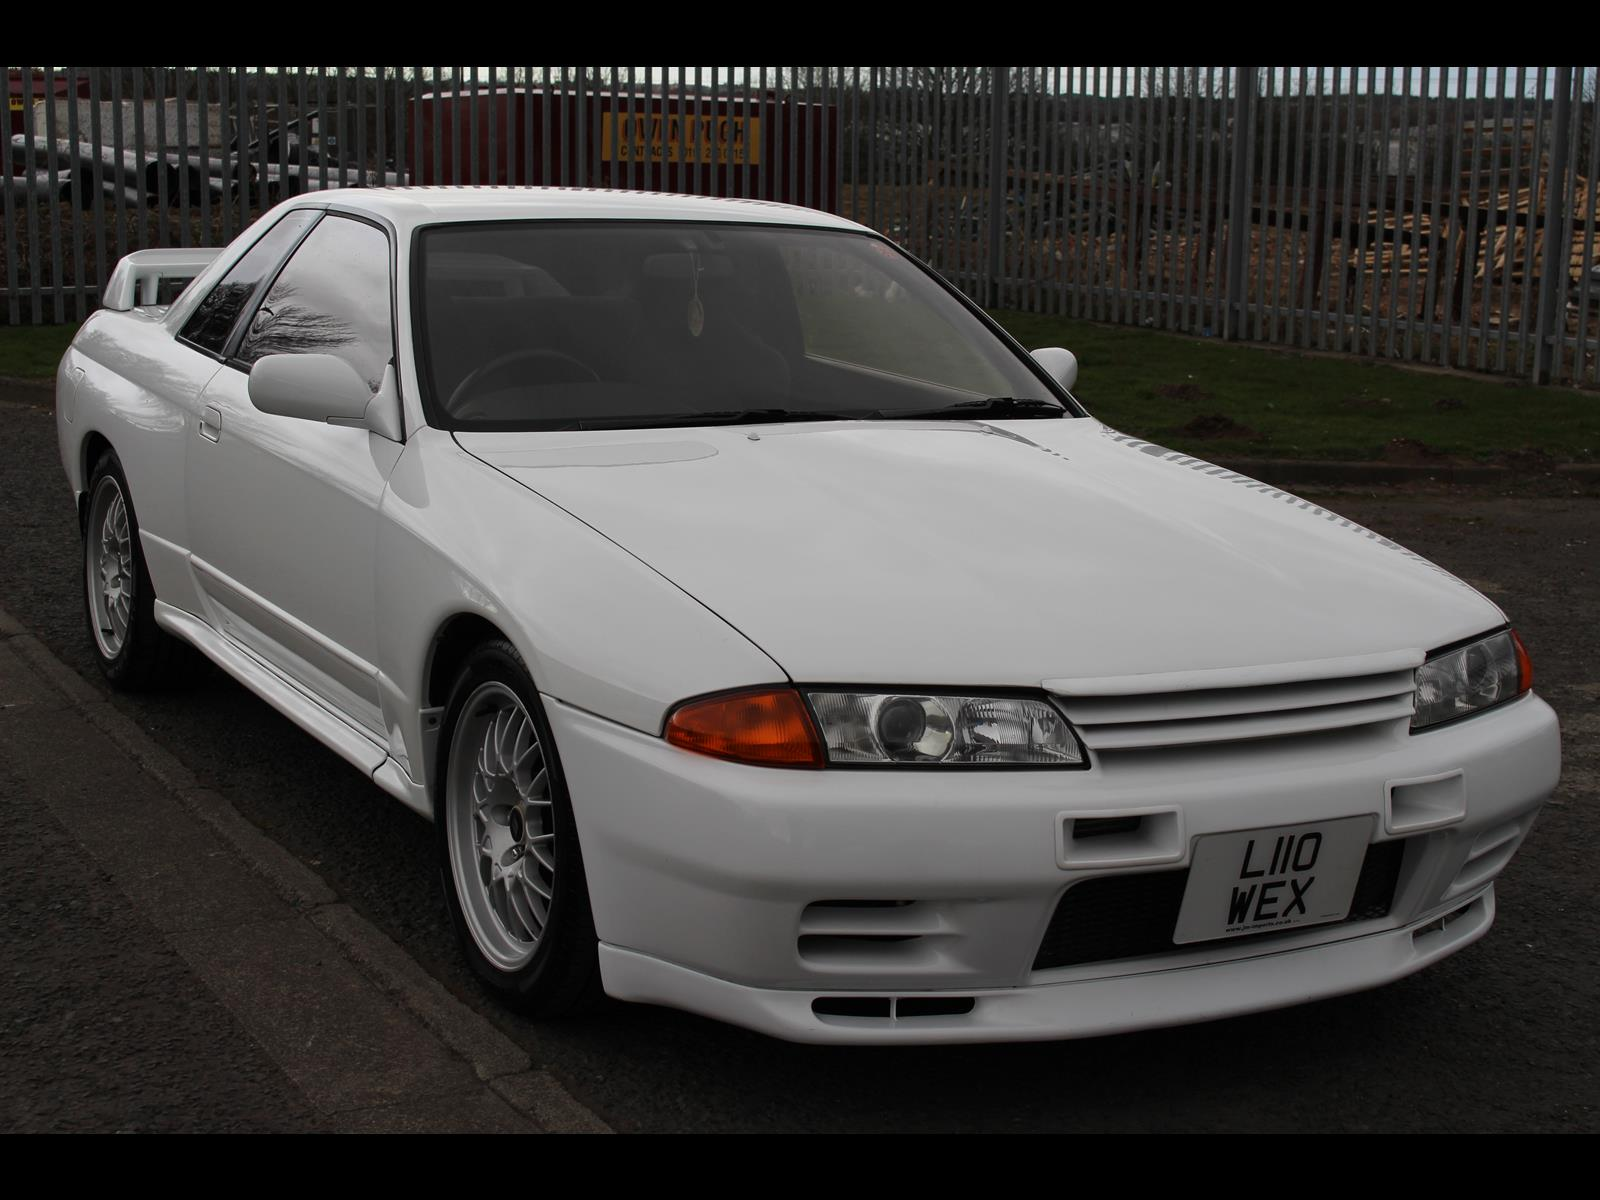 1993 Nissan Skyline R32 GTR V-Spec N1 Spec Engine GT2860